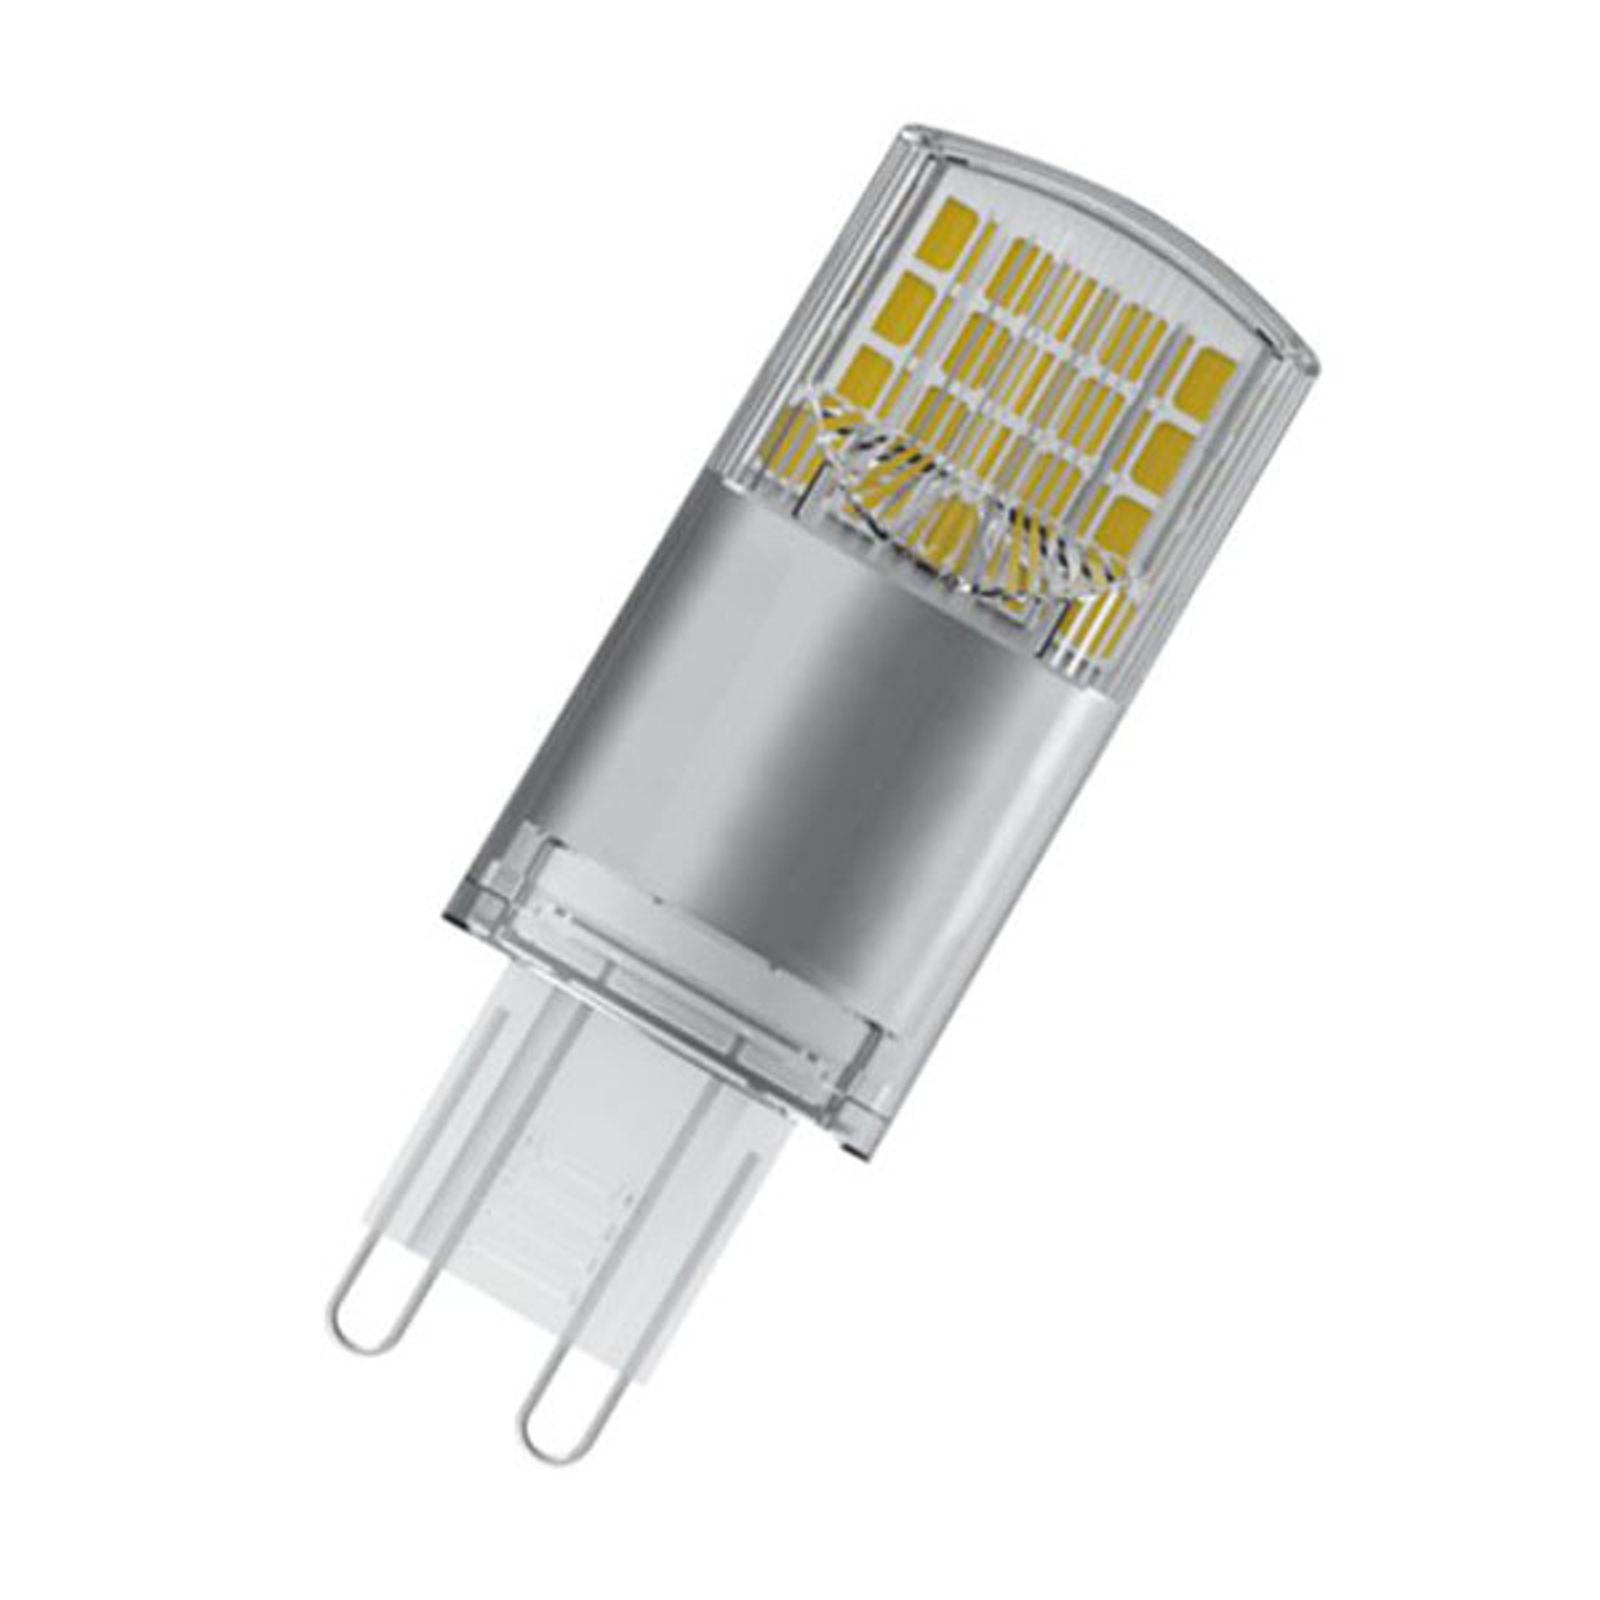 OSRAM 2 ampoules broche LED G9 3,8W 2700K transp